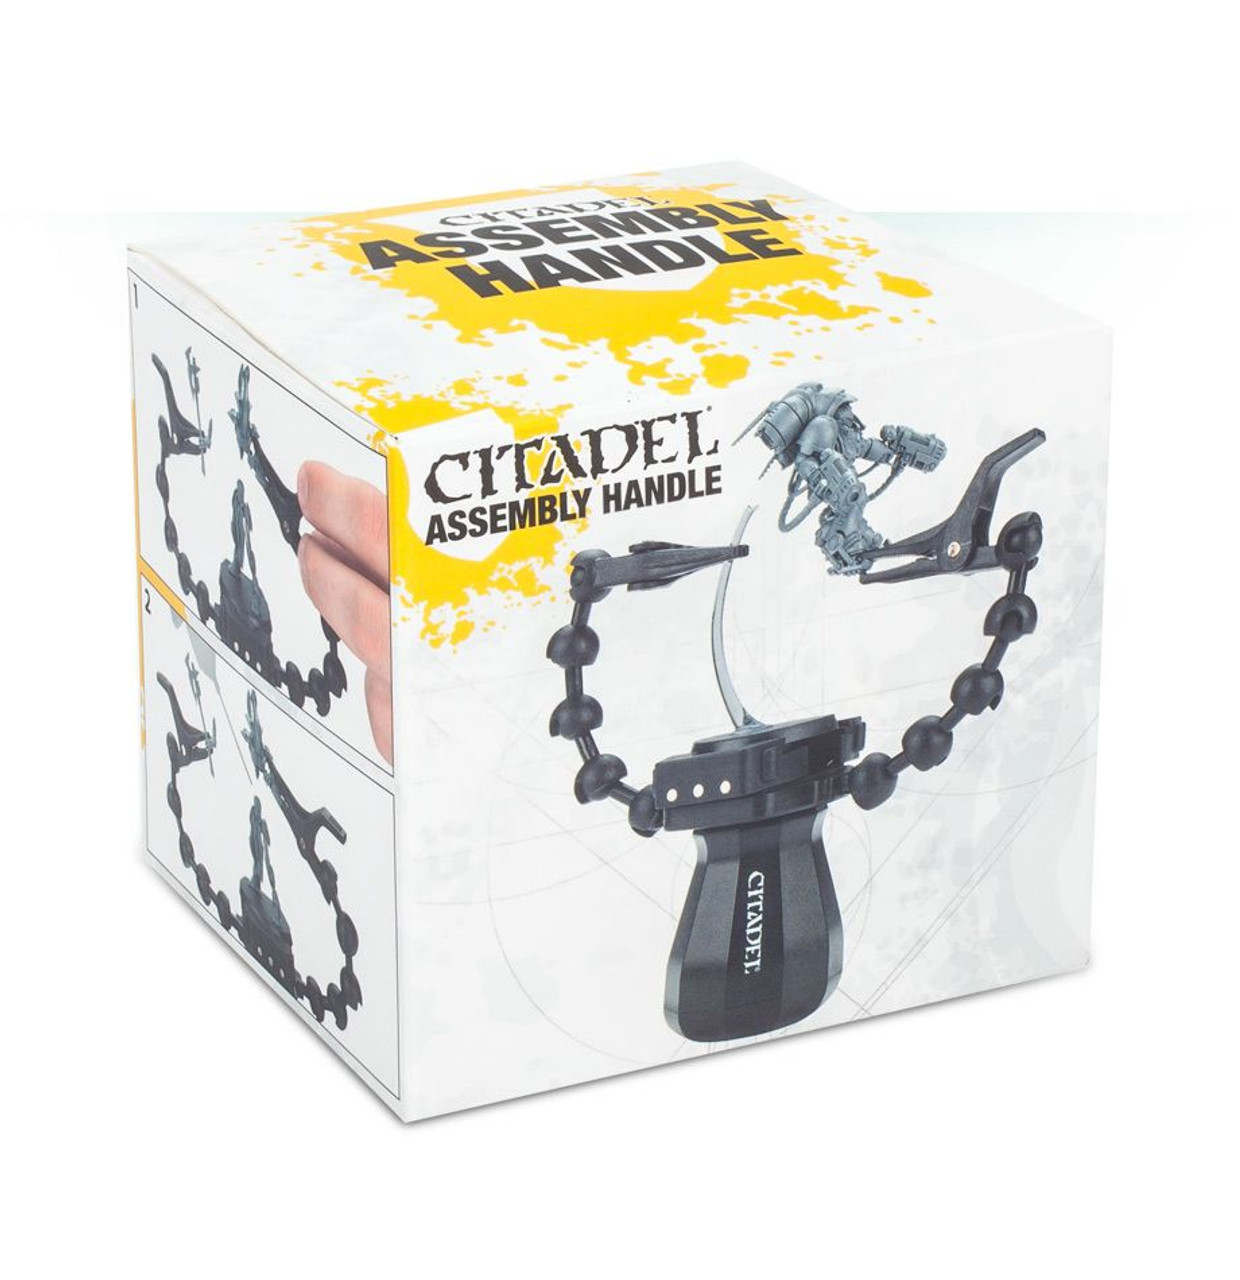 Citadel: Assembly Handle